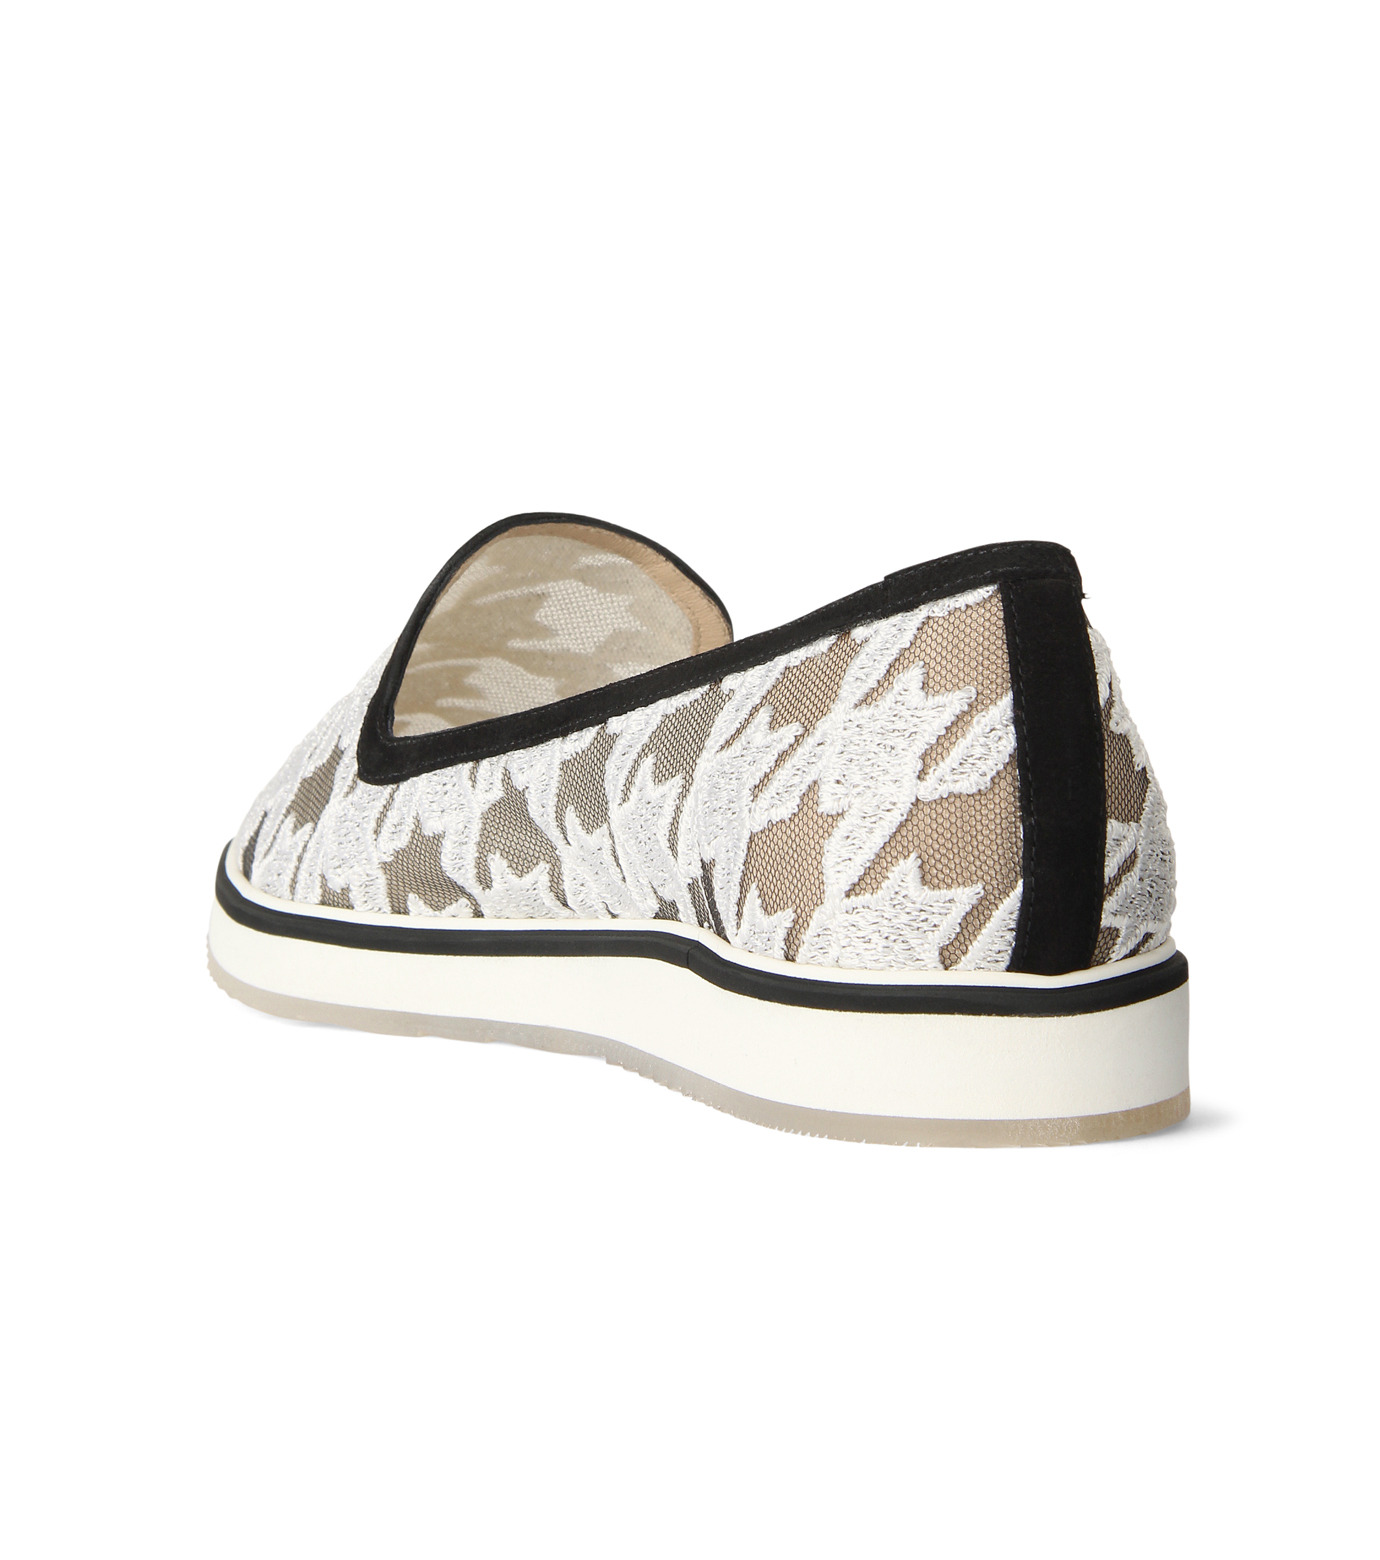 Nicholas  Kirkwood(ニコラス カークウッド)の35mm Alona Lace Loafer-WHITE(フラットシューズ/Flat shoes)-15A093-4 拡大詳細画像2